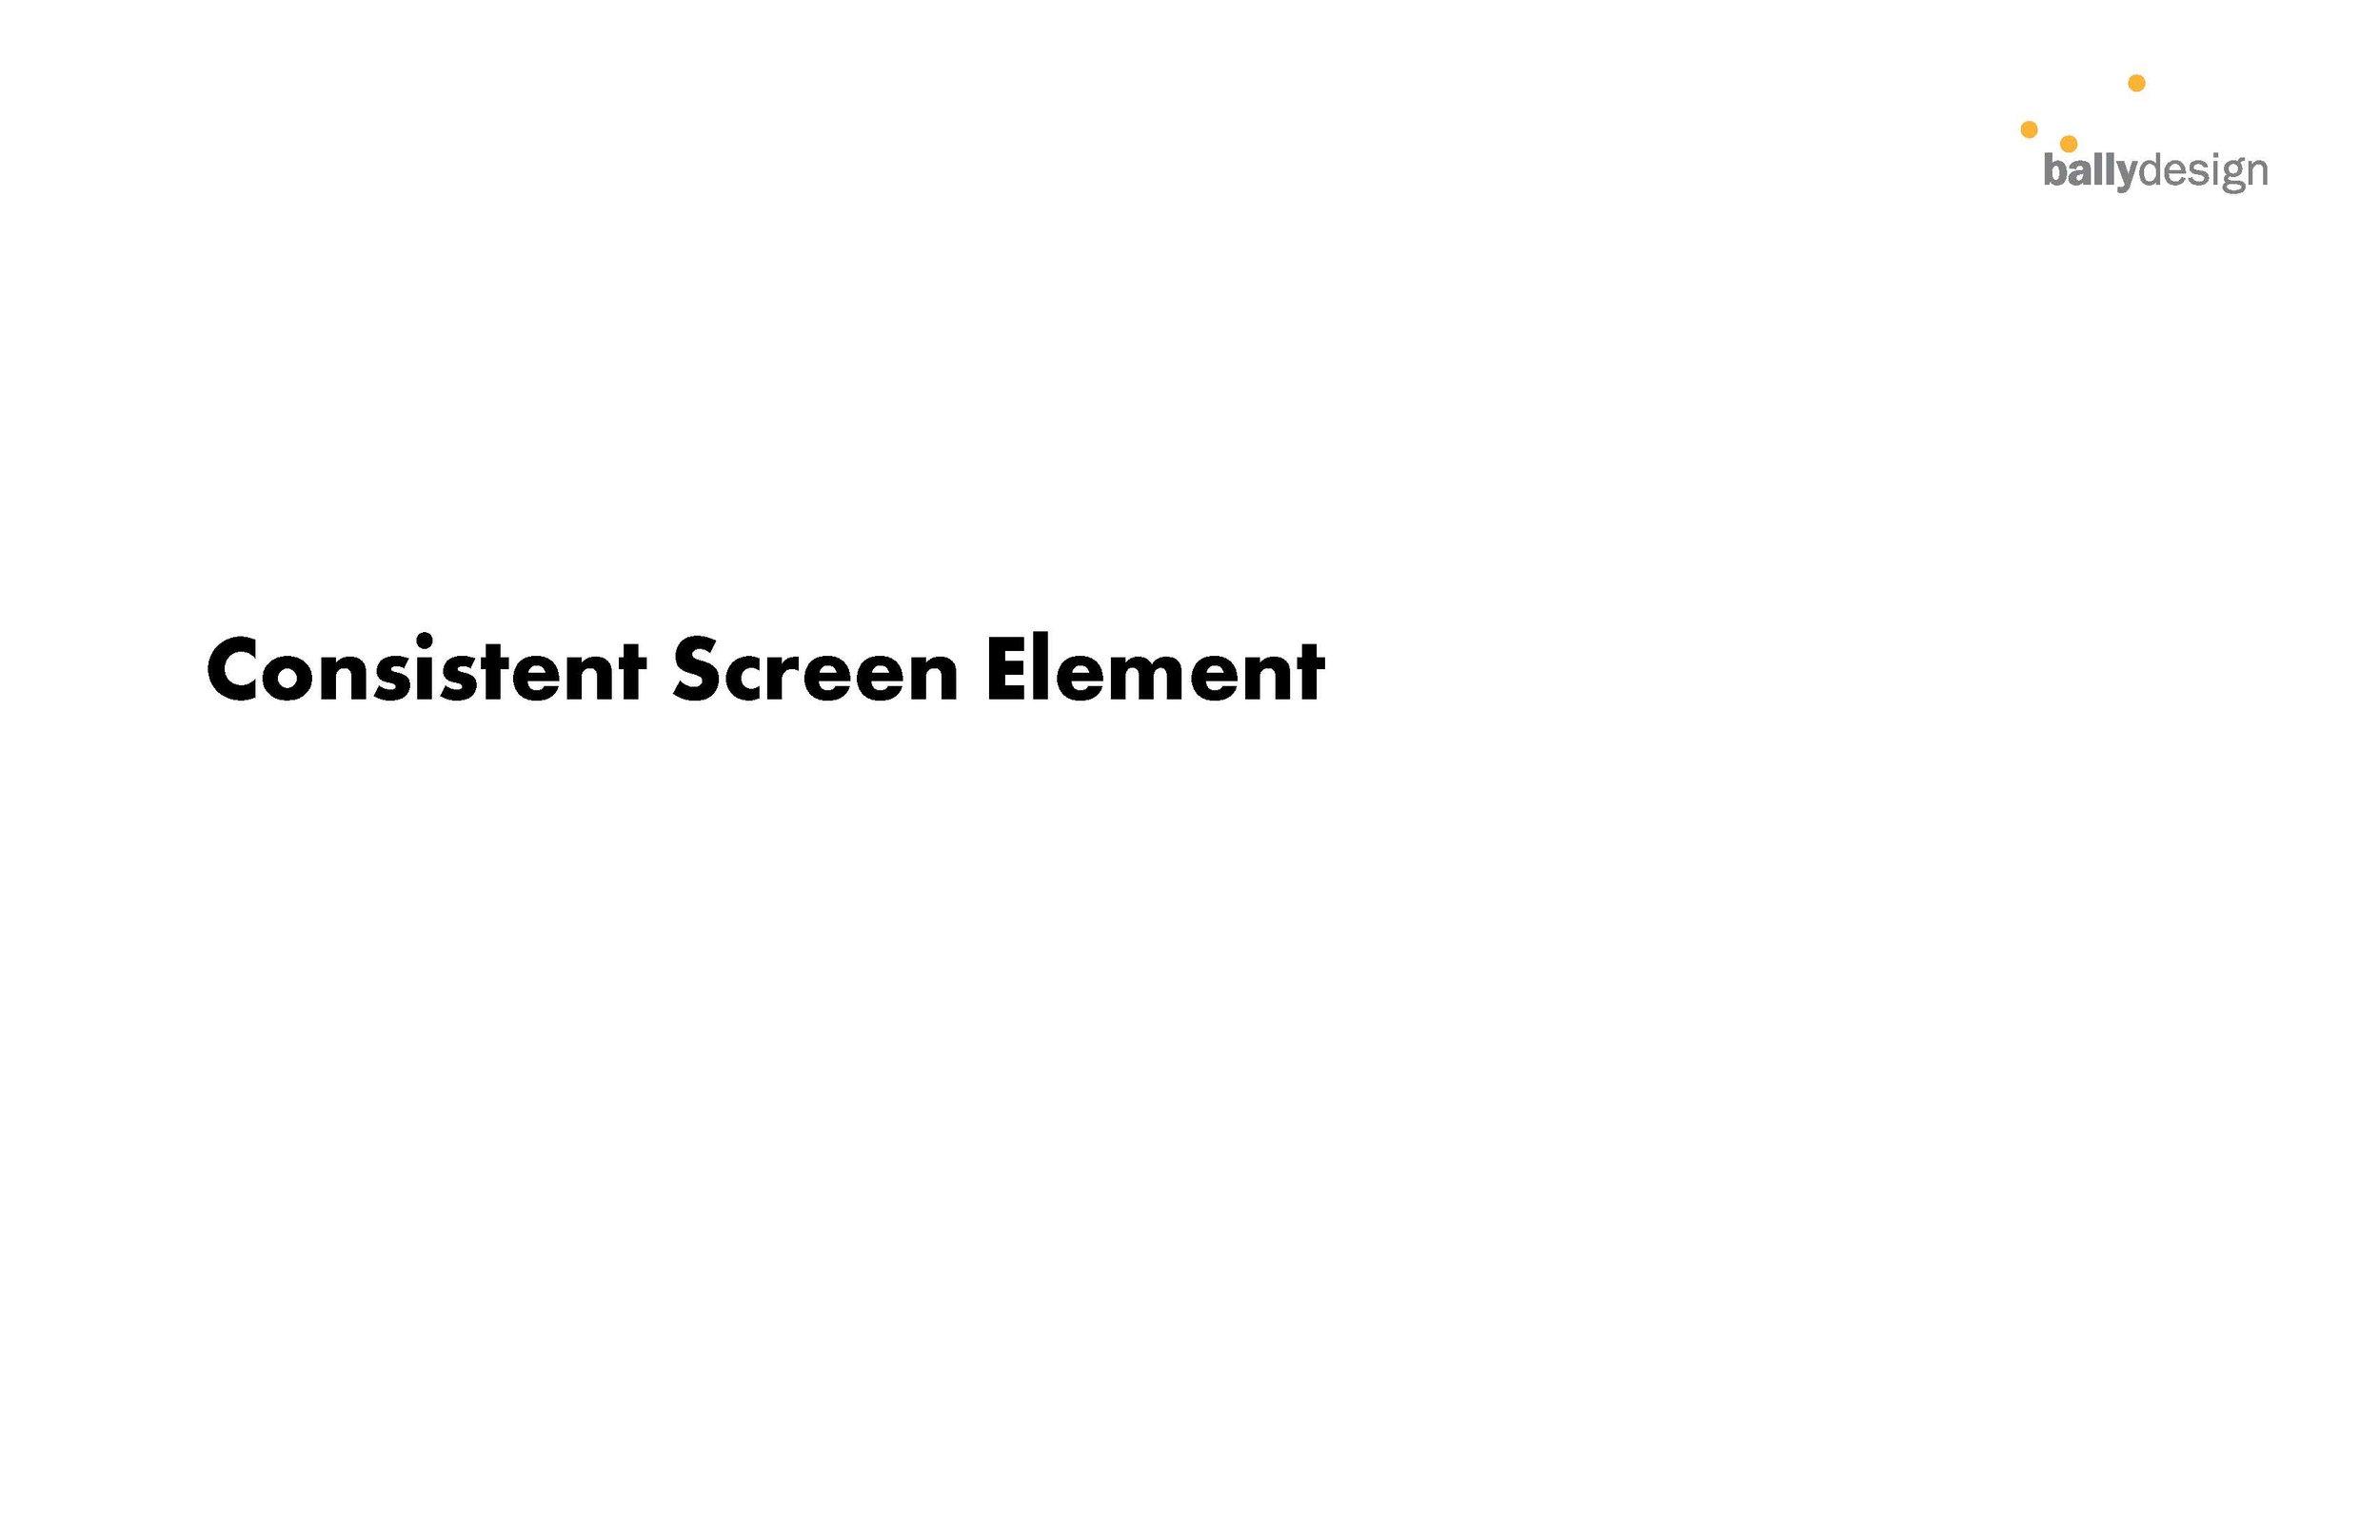 Real_Internship Final Presentation_Page_23.jpg